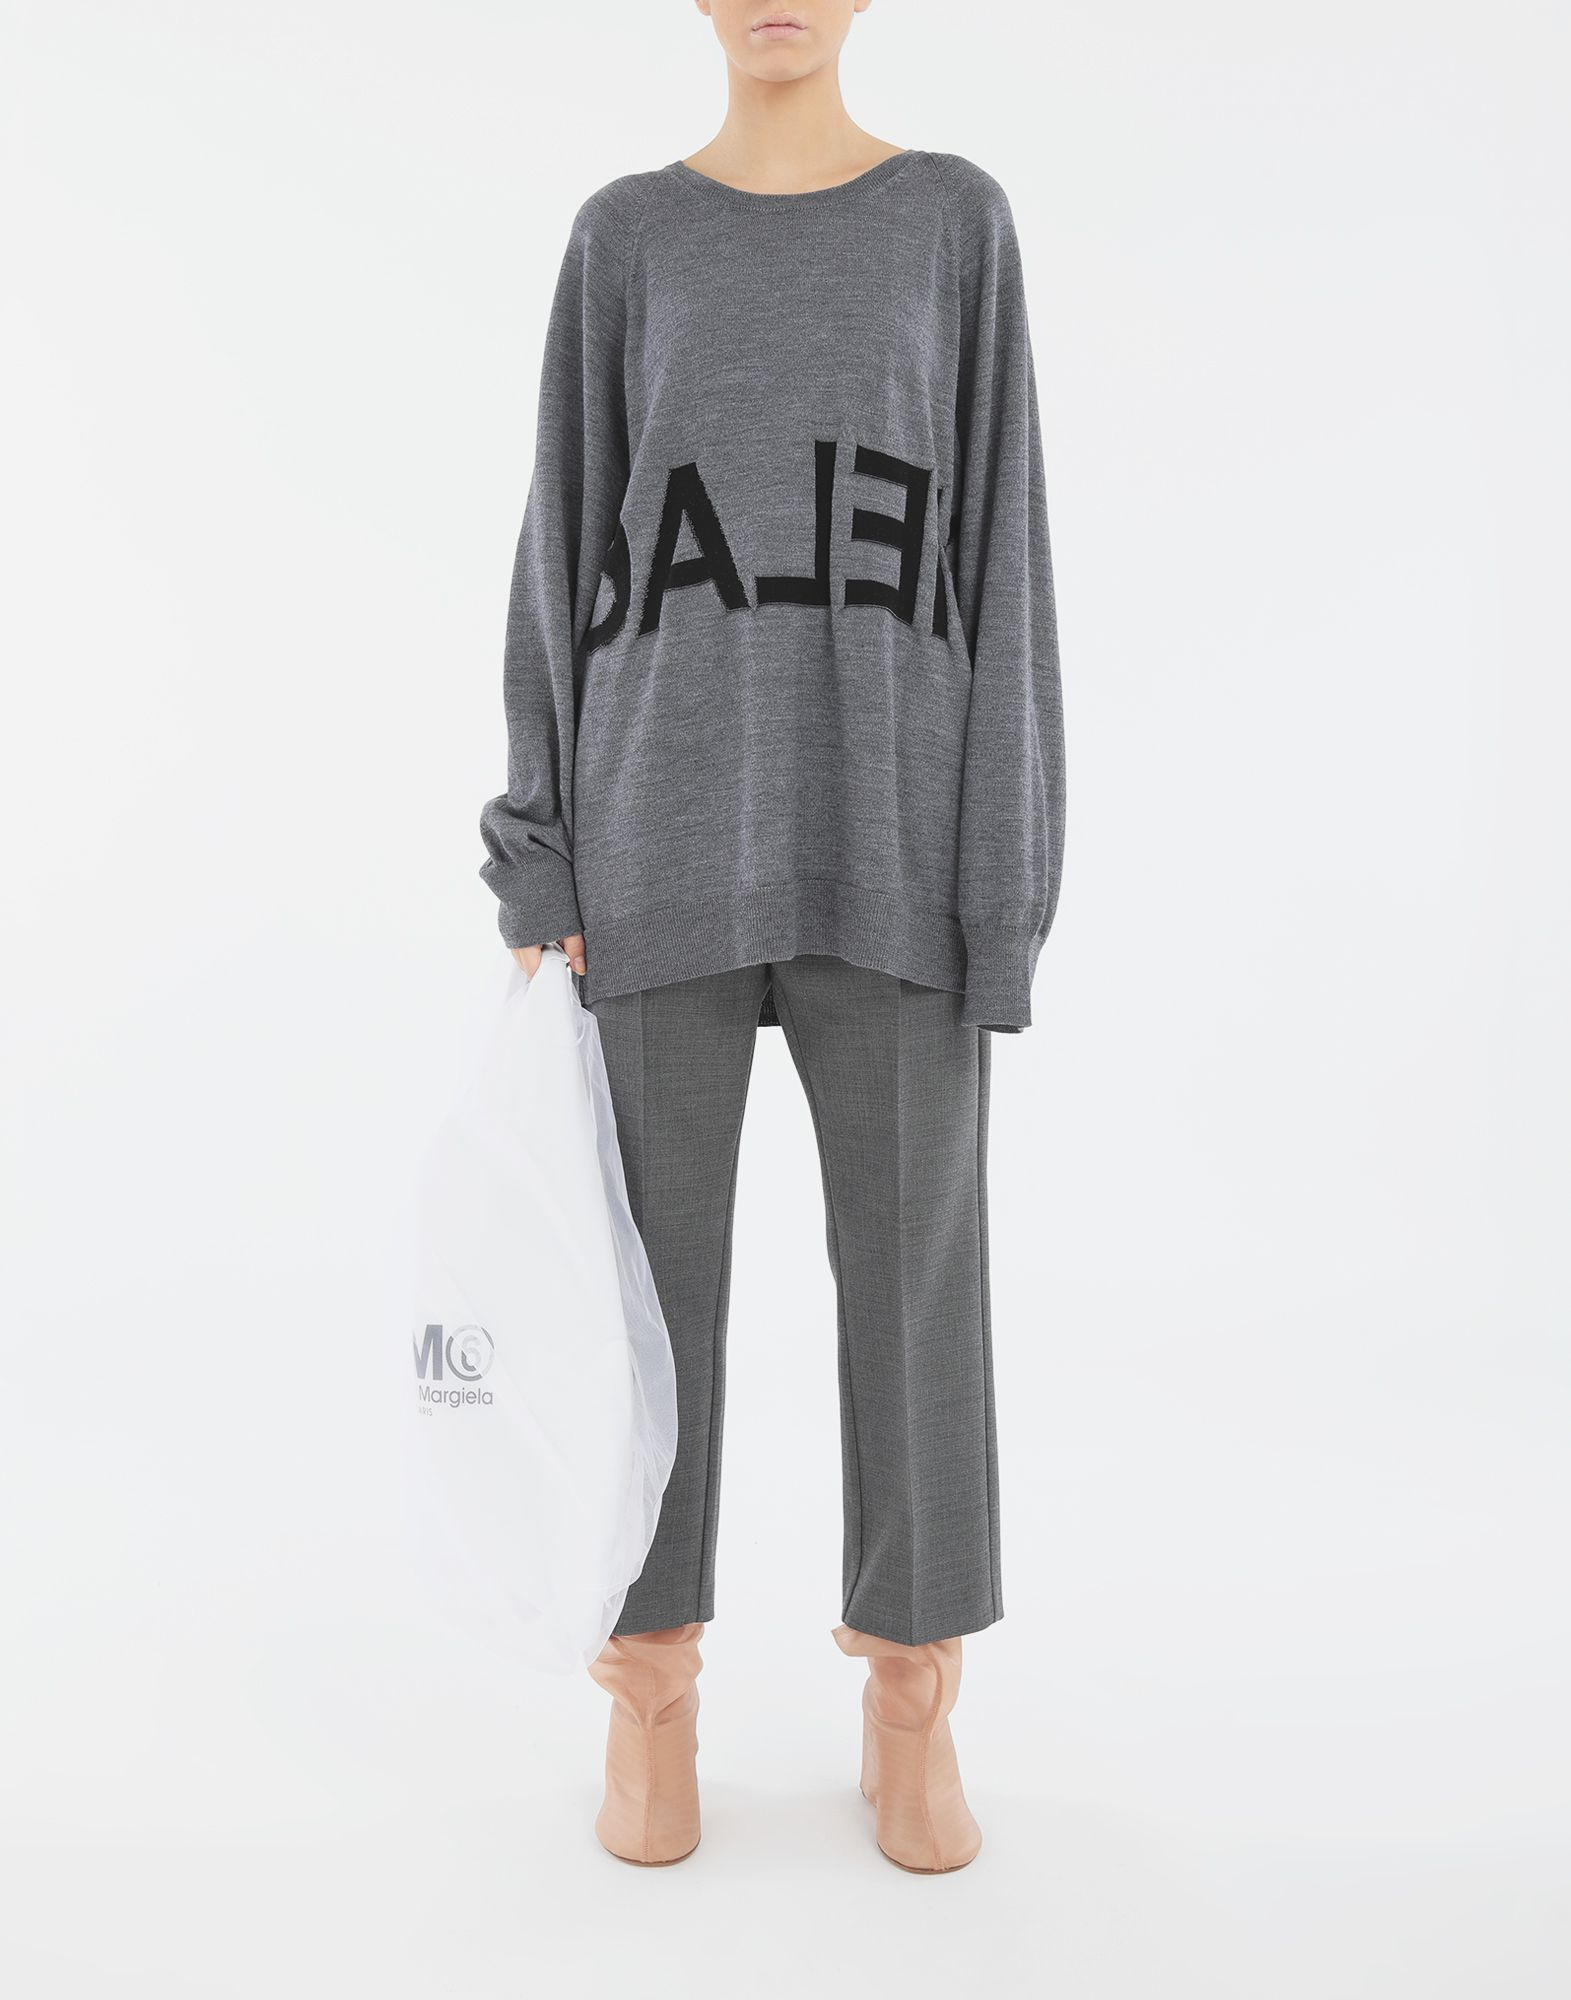 MM6 MAISON MARGIELA Reversed logo sweater Crewneck sweater Woman d